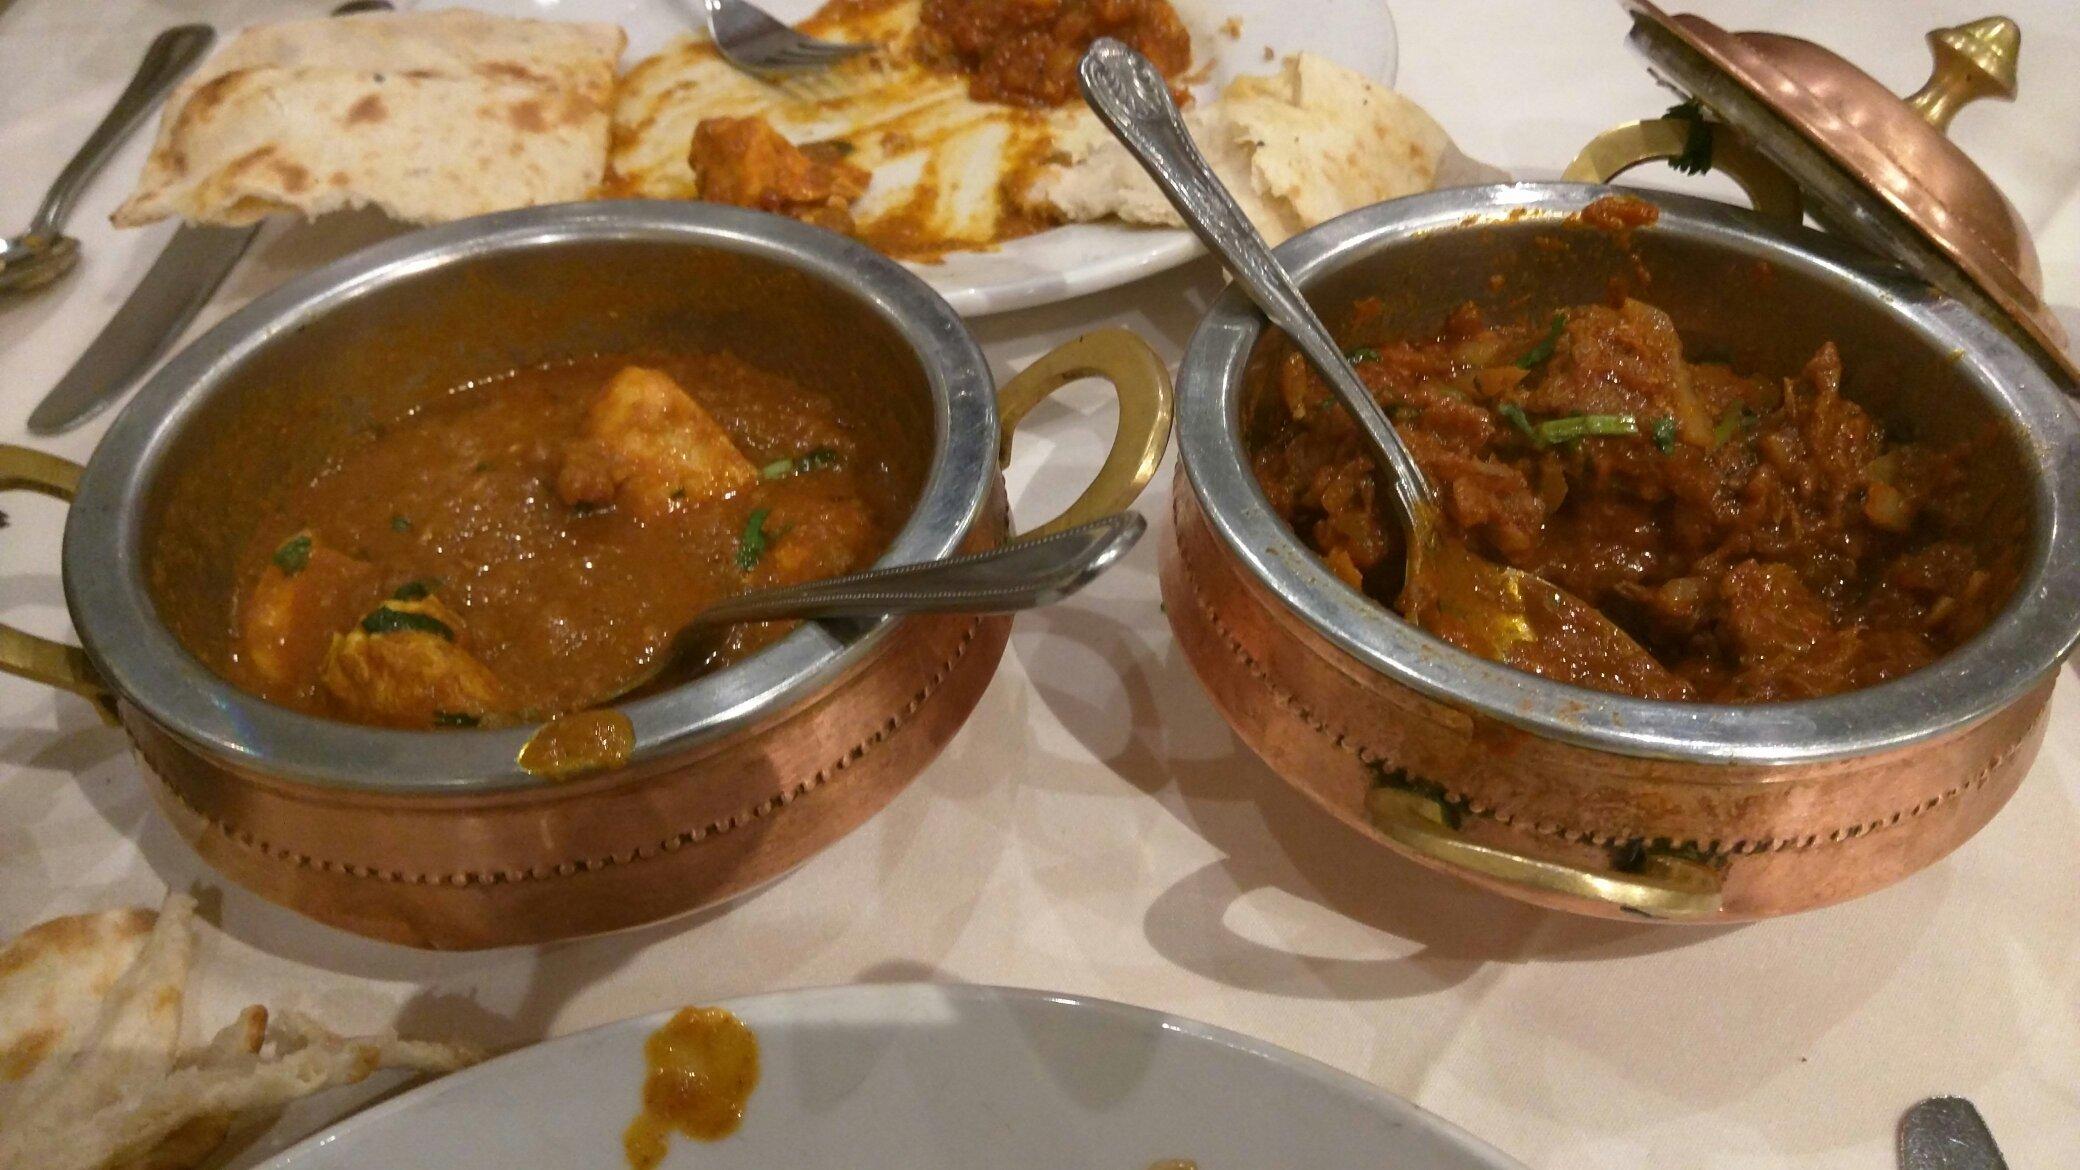 Takeaway Balti Dishes Dilruba Indian Restaurant Rugby CV21